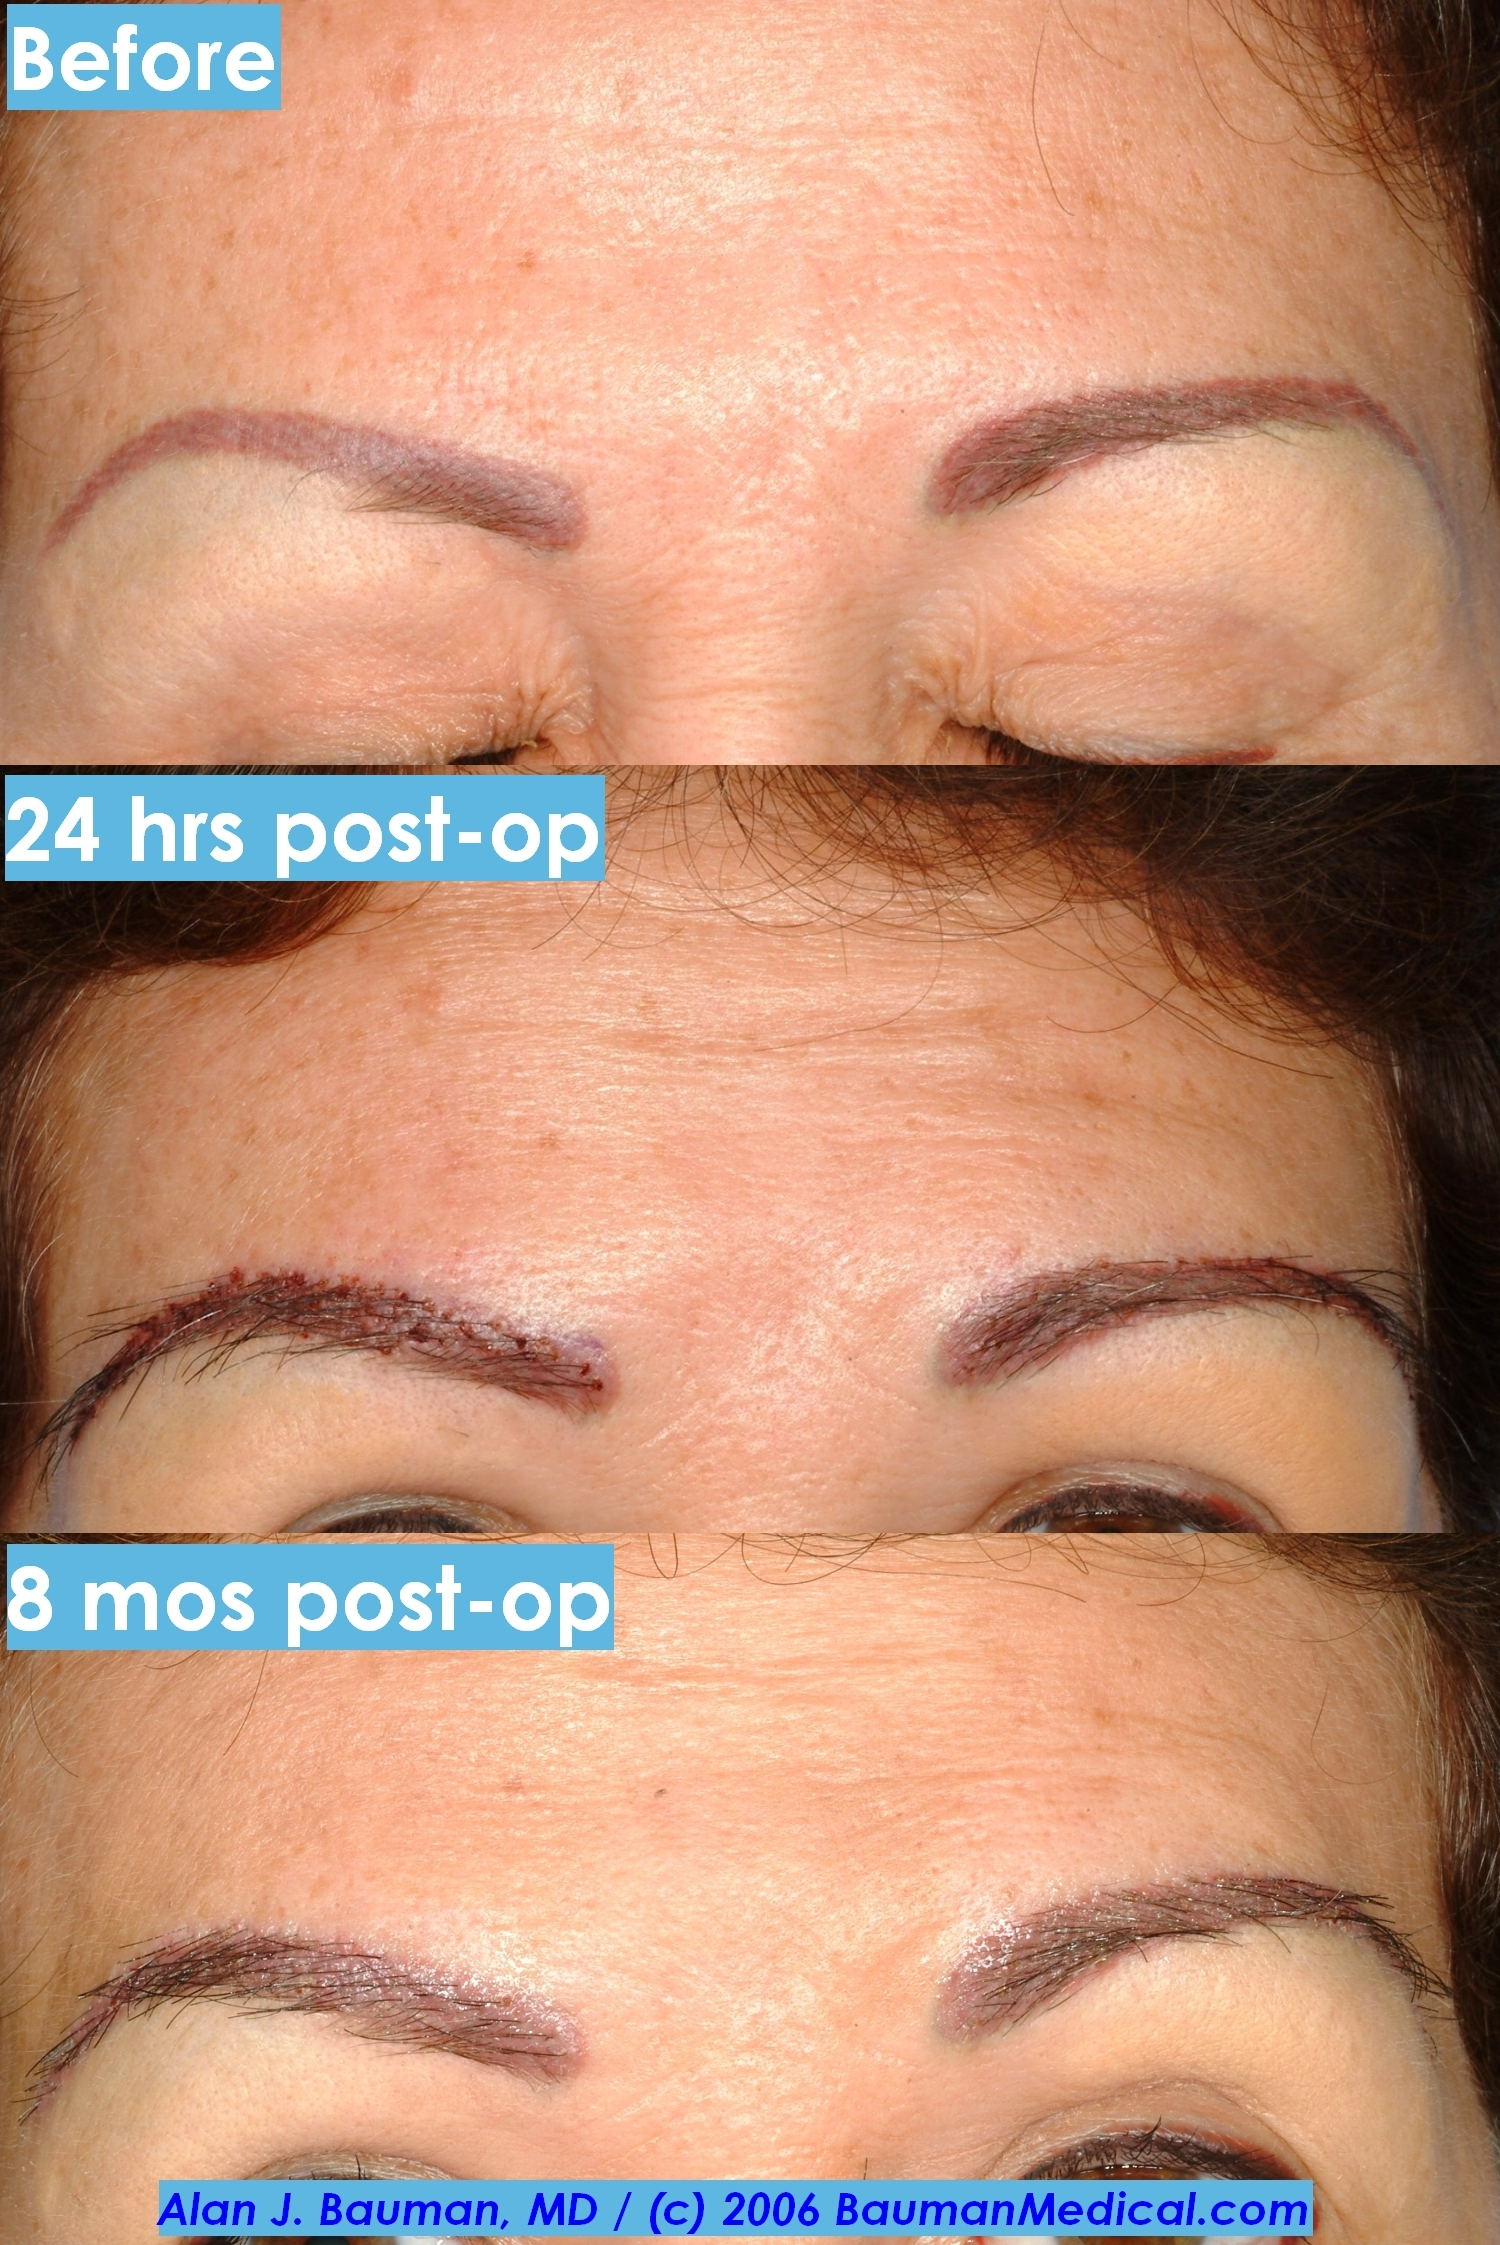 eyebrow%203 vert%20logo lg Eyebrow Transplantation